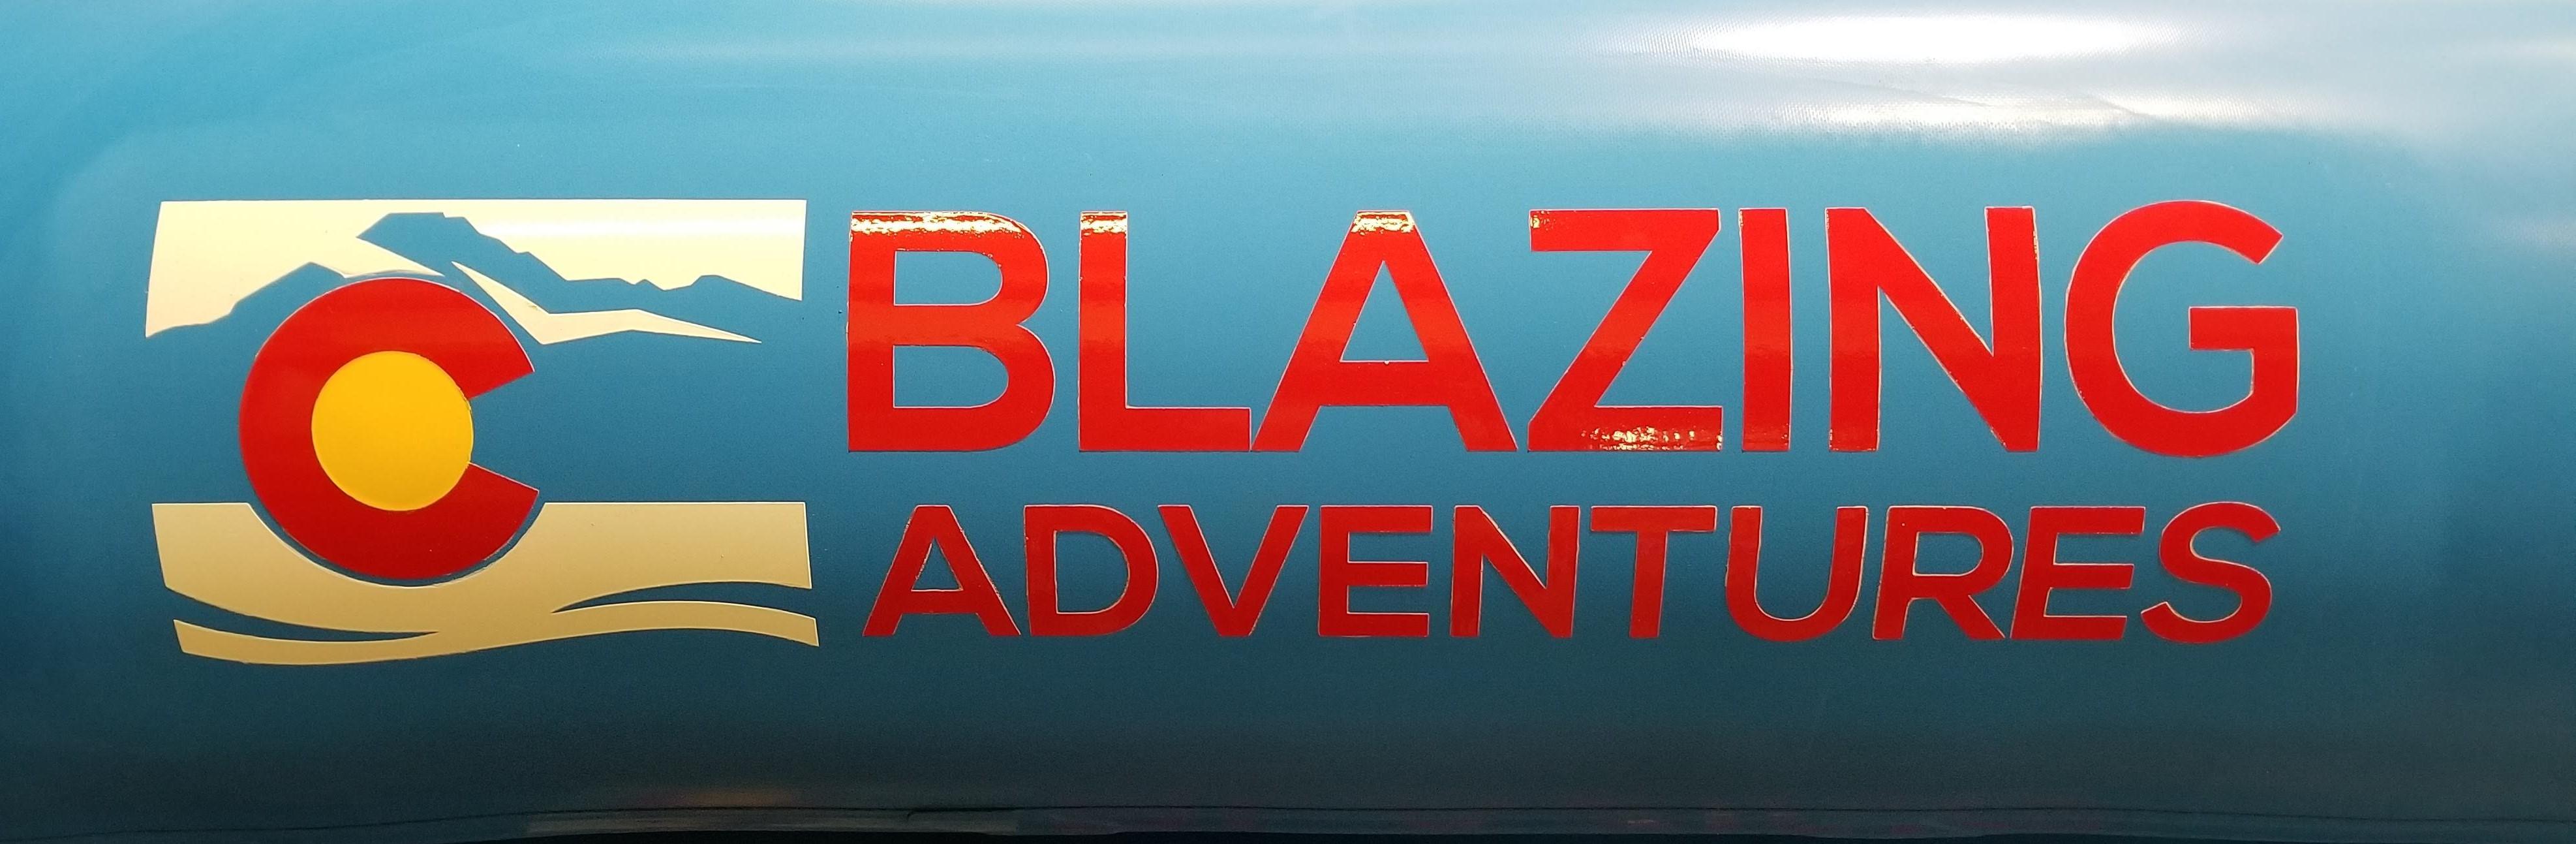 Blazing Adventures Rafting Logo